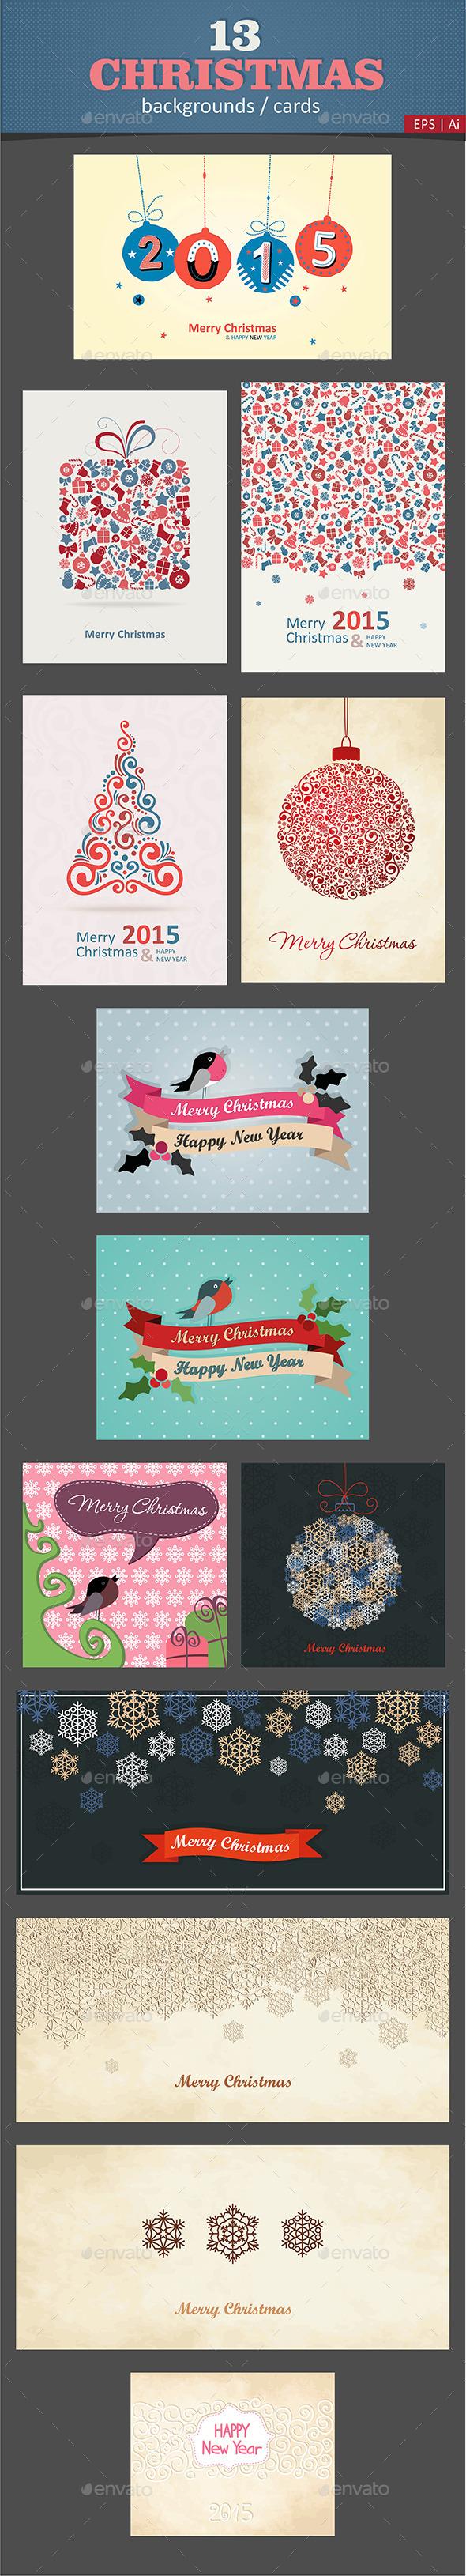 13 Christmas Cards / Backgrounds Vector - Christmas Seasons/Holidays